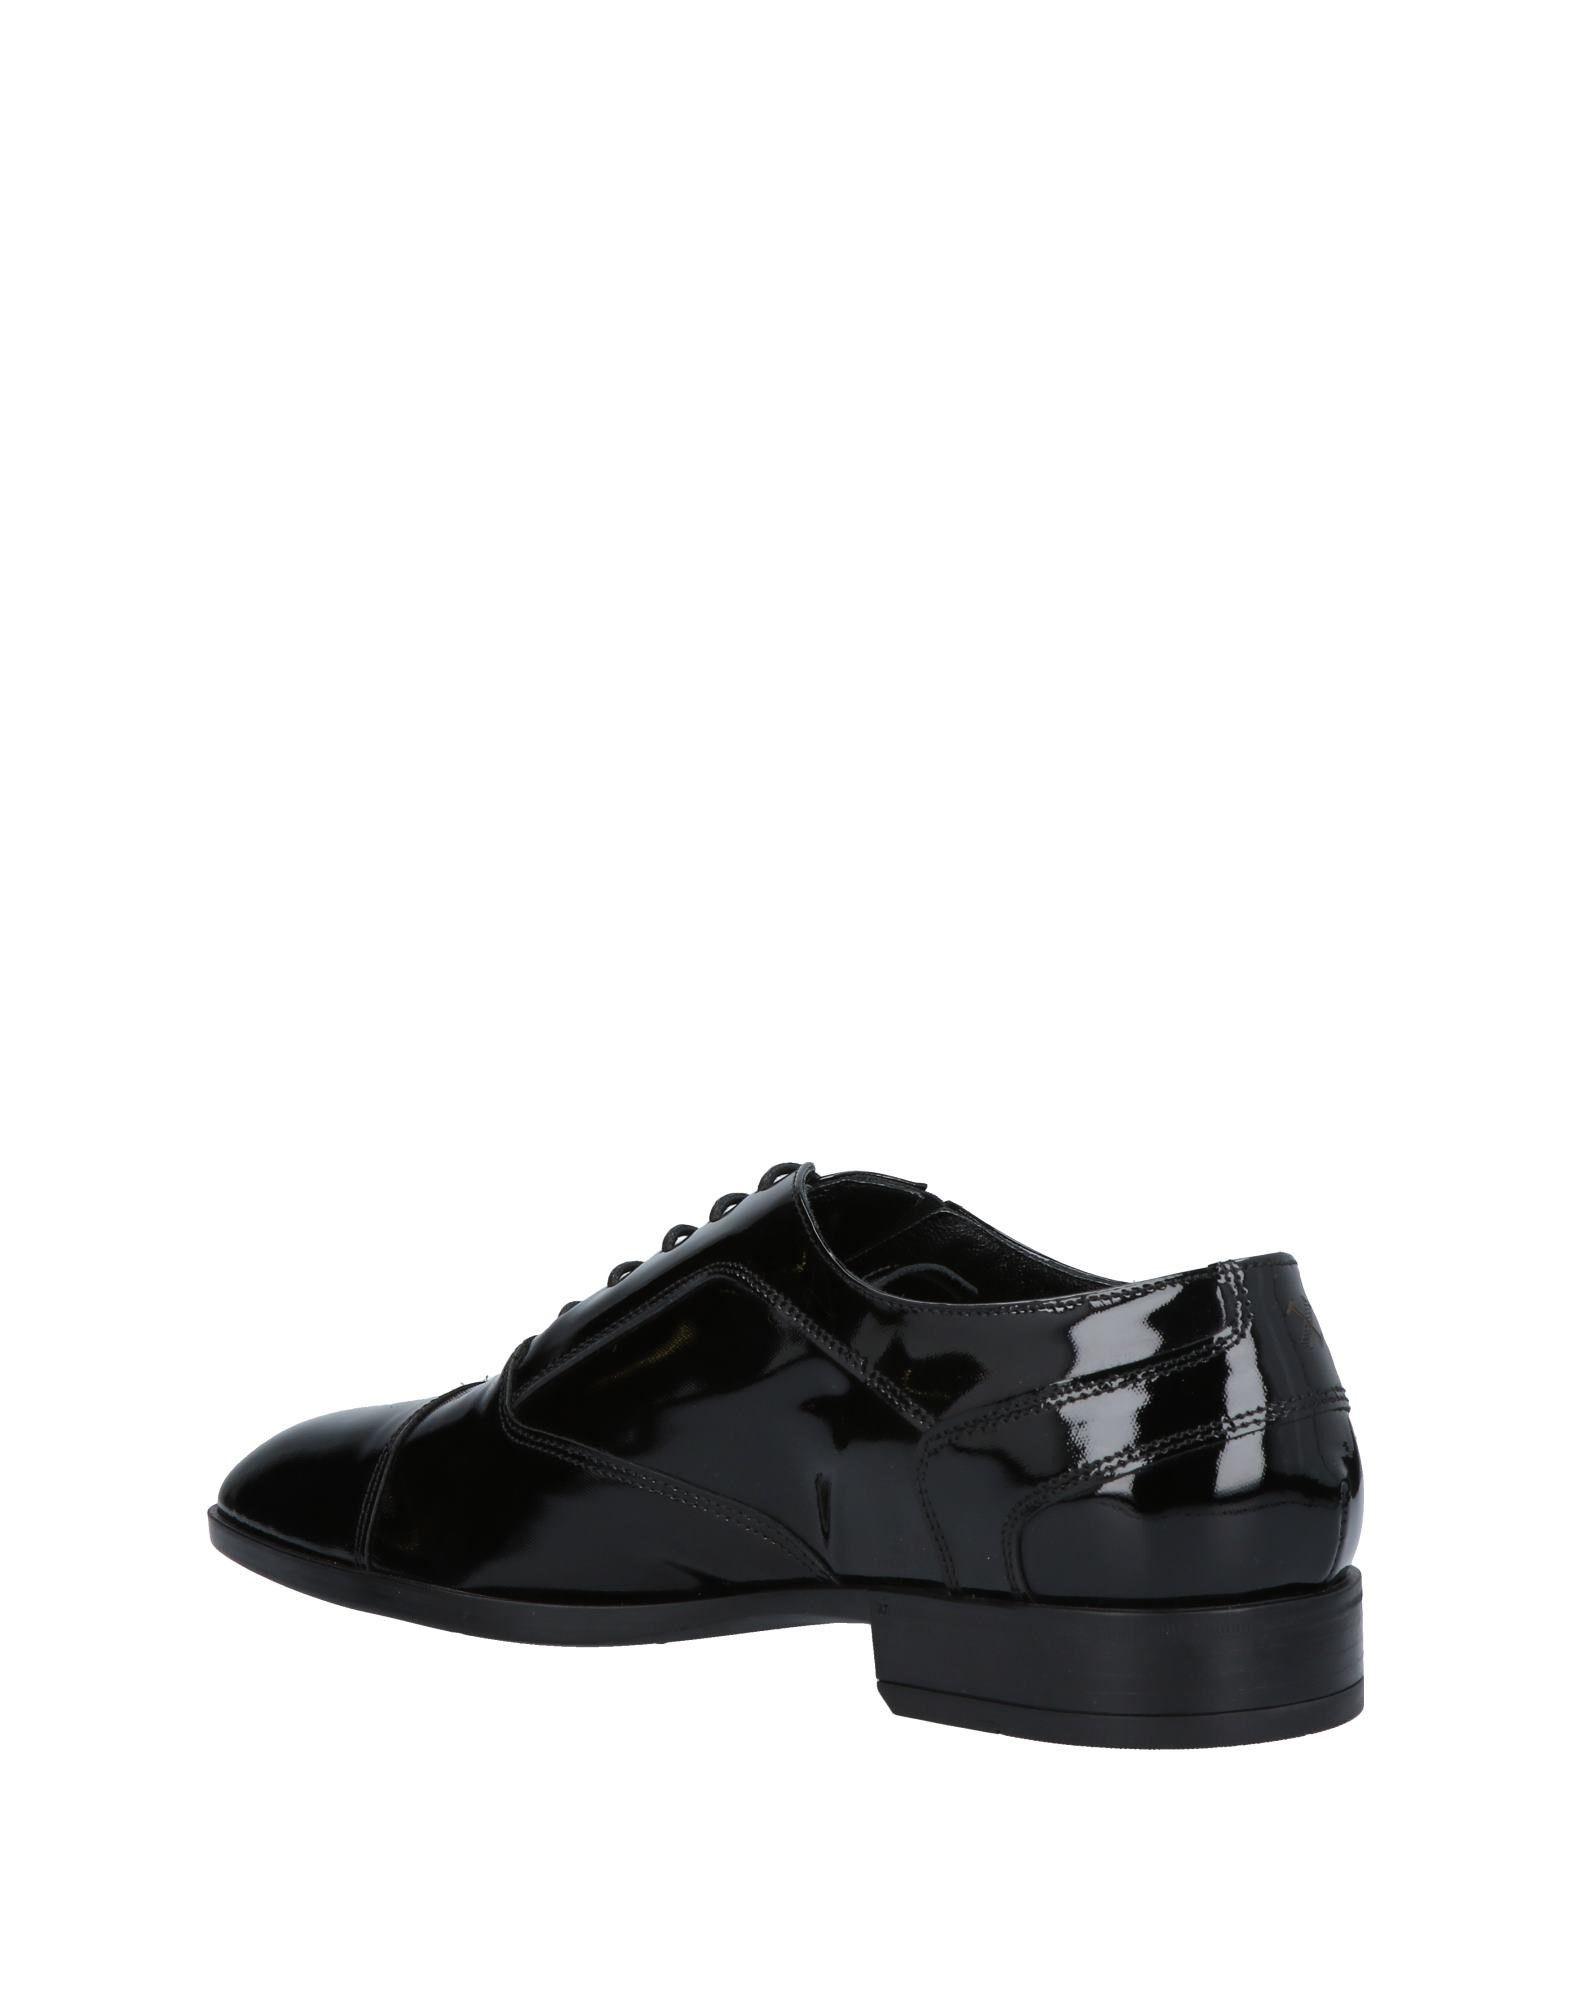 Rabatt echte Schuhe Alexander Trend Schnürschuhe Herren  11429184KL 11429184KL 11429184KL 2fe998